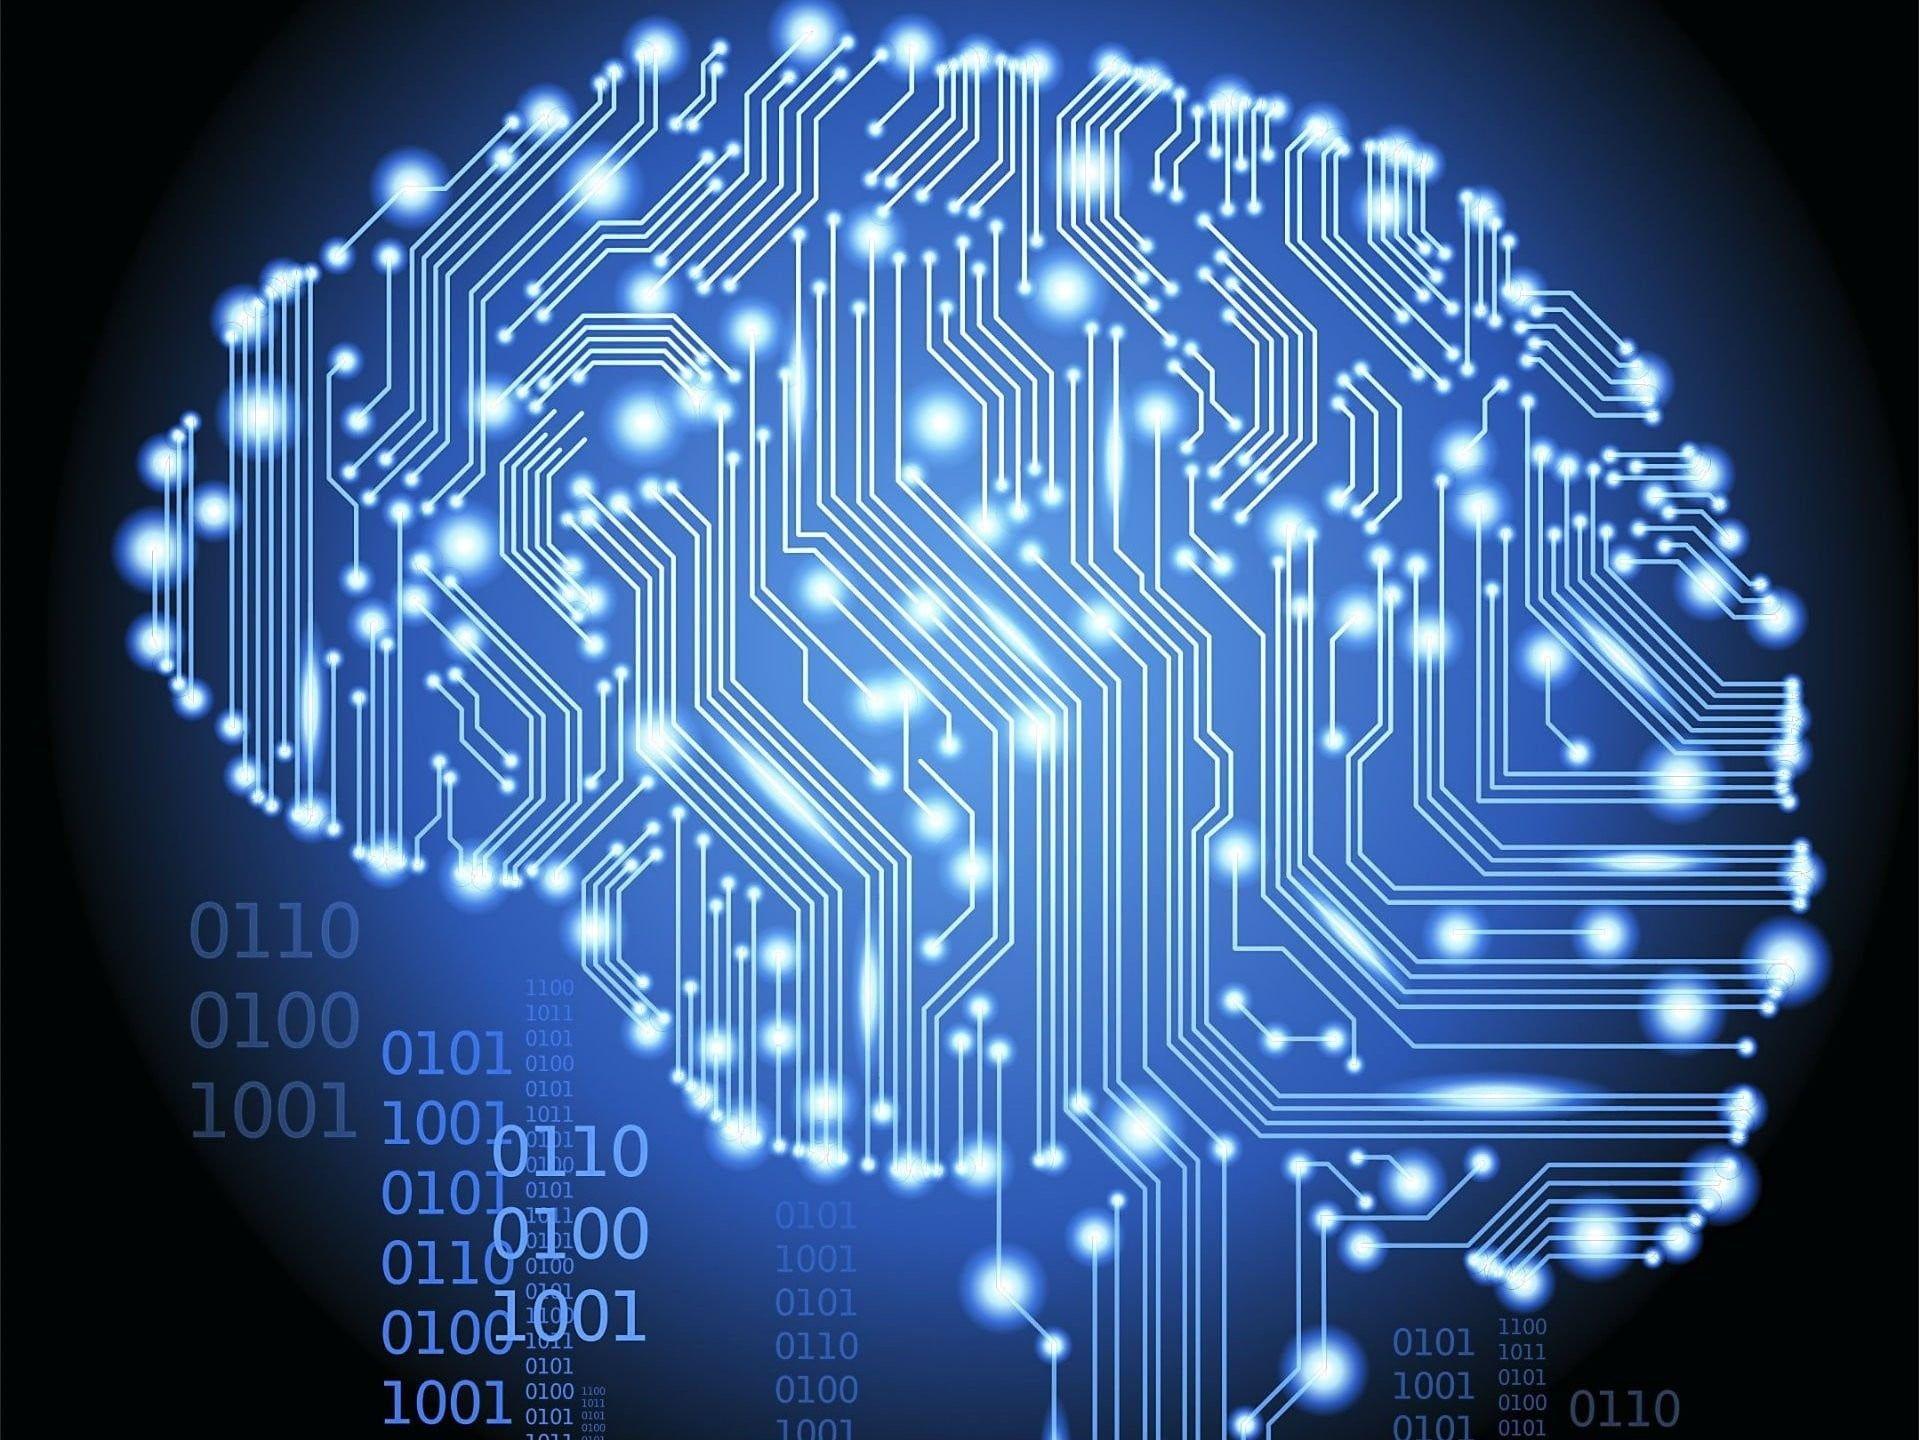 Blue Digital Wallpaper Binary Brain Technology Artificial Intelligence Technology Machine Learning Artificial Intelligence Artificial Intelligence Article